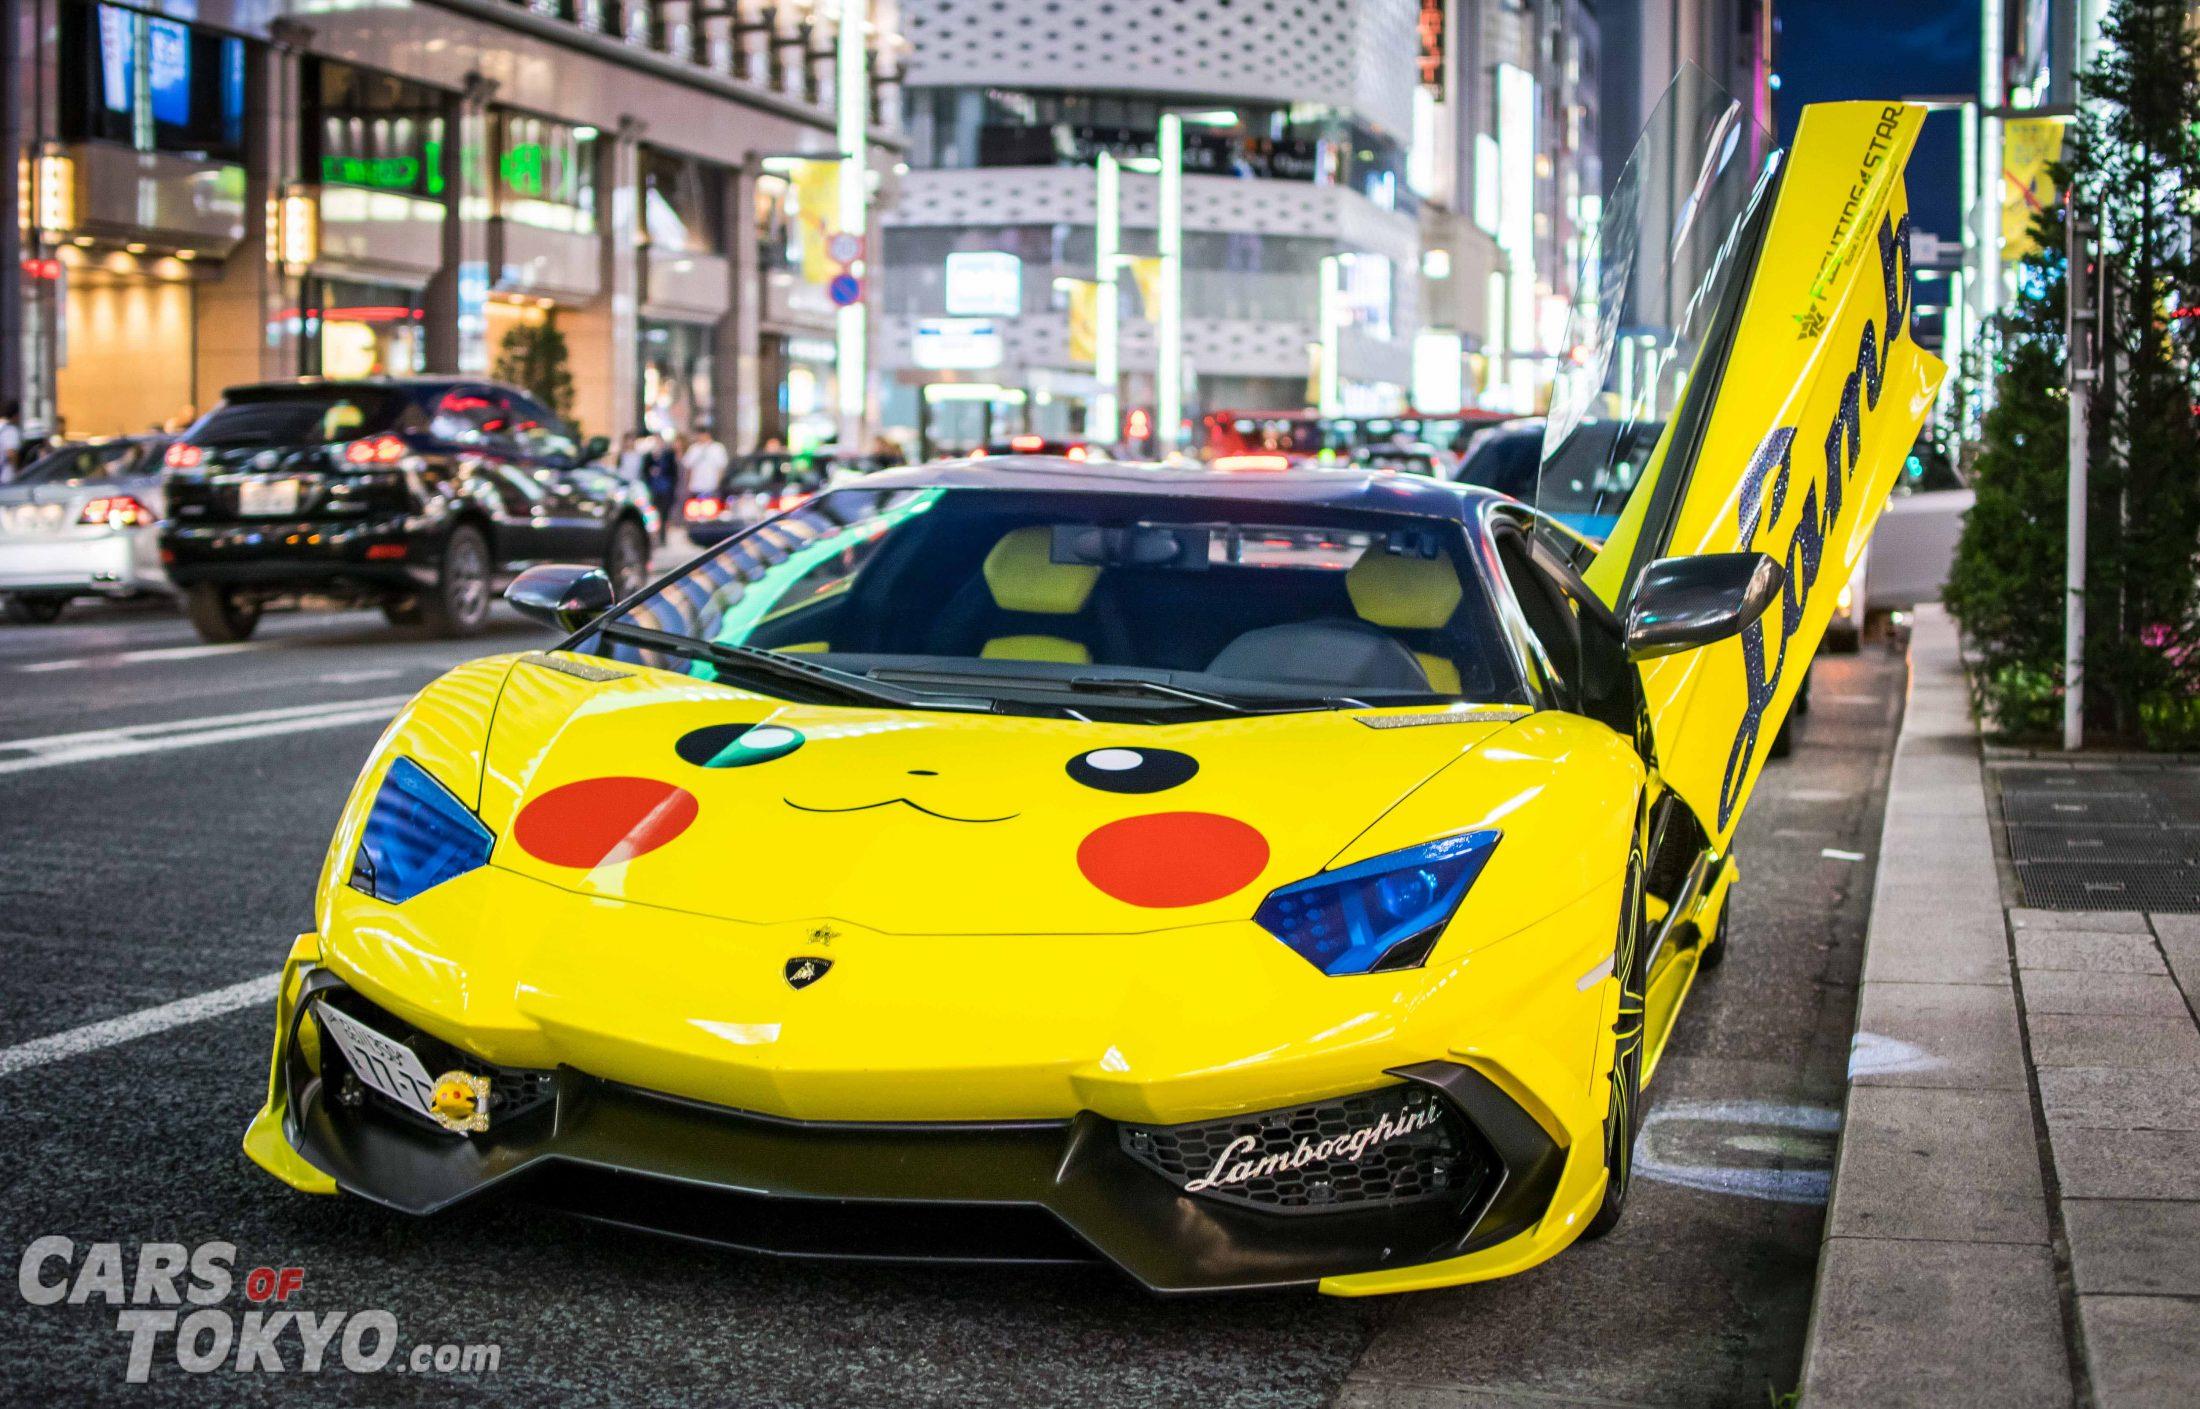 cars-of-tokyo-modified-lamborghini-aventador-morohoshi-pikachu